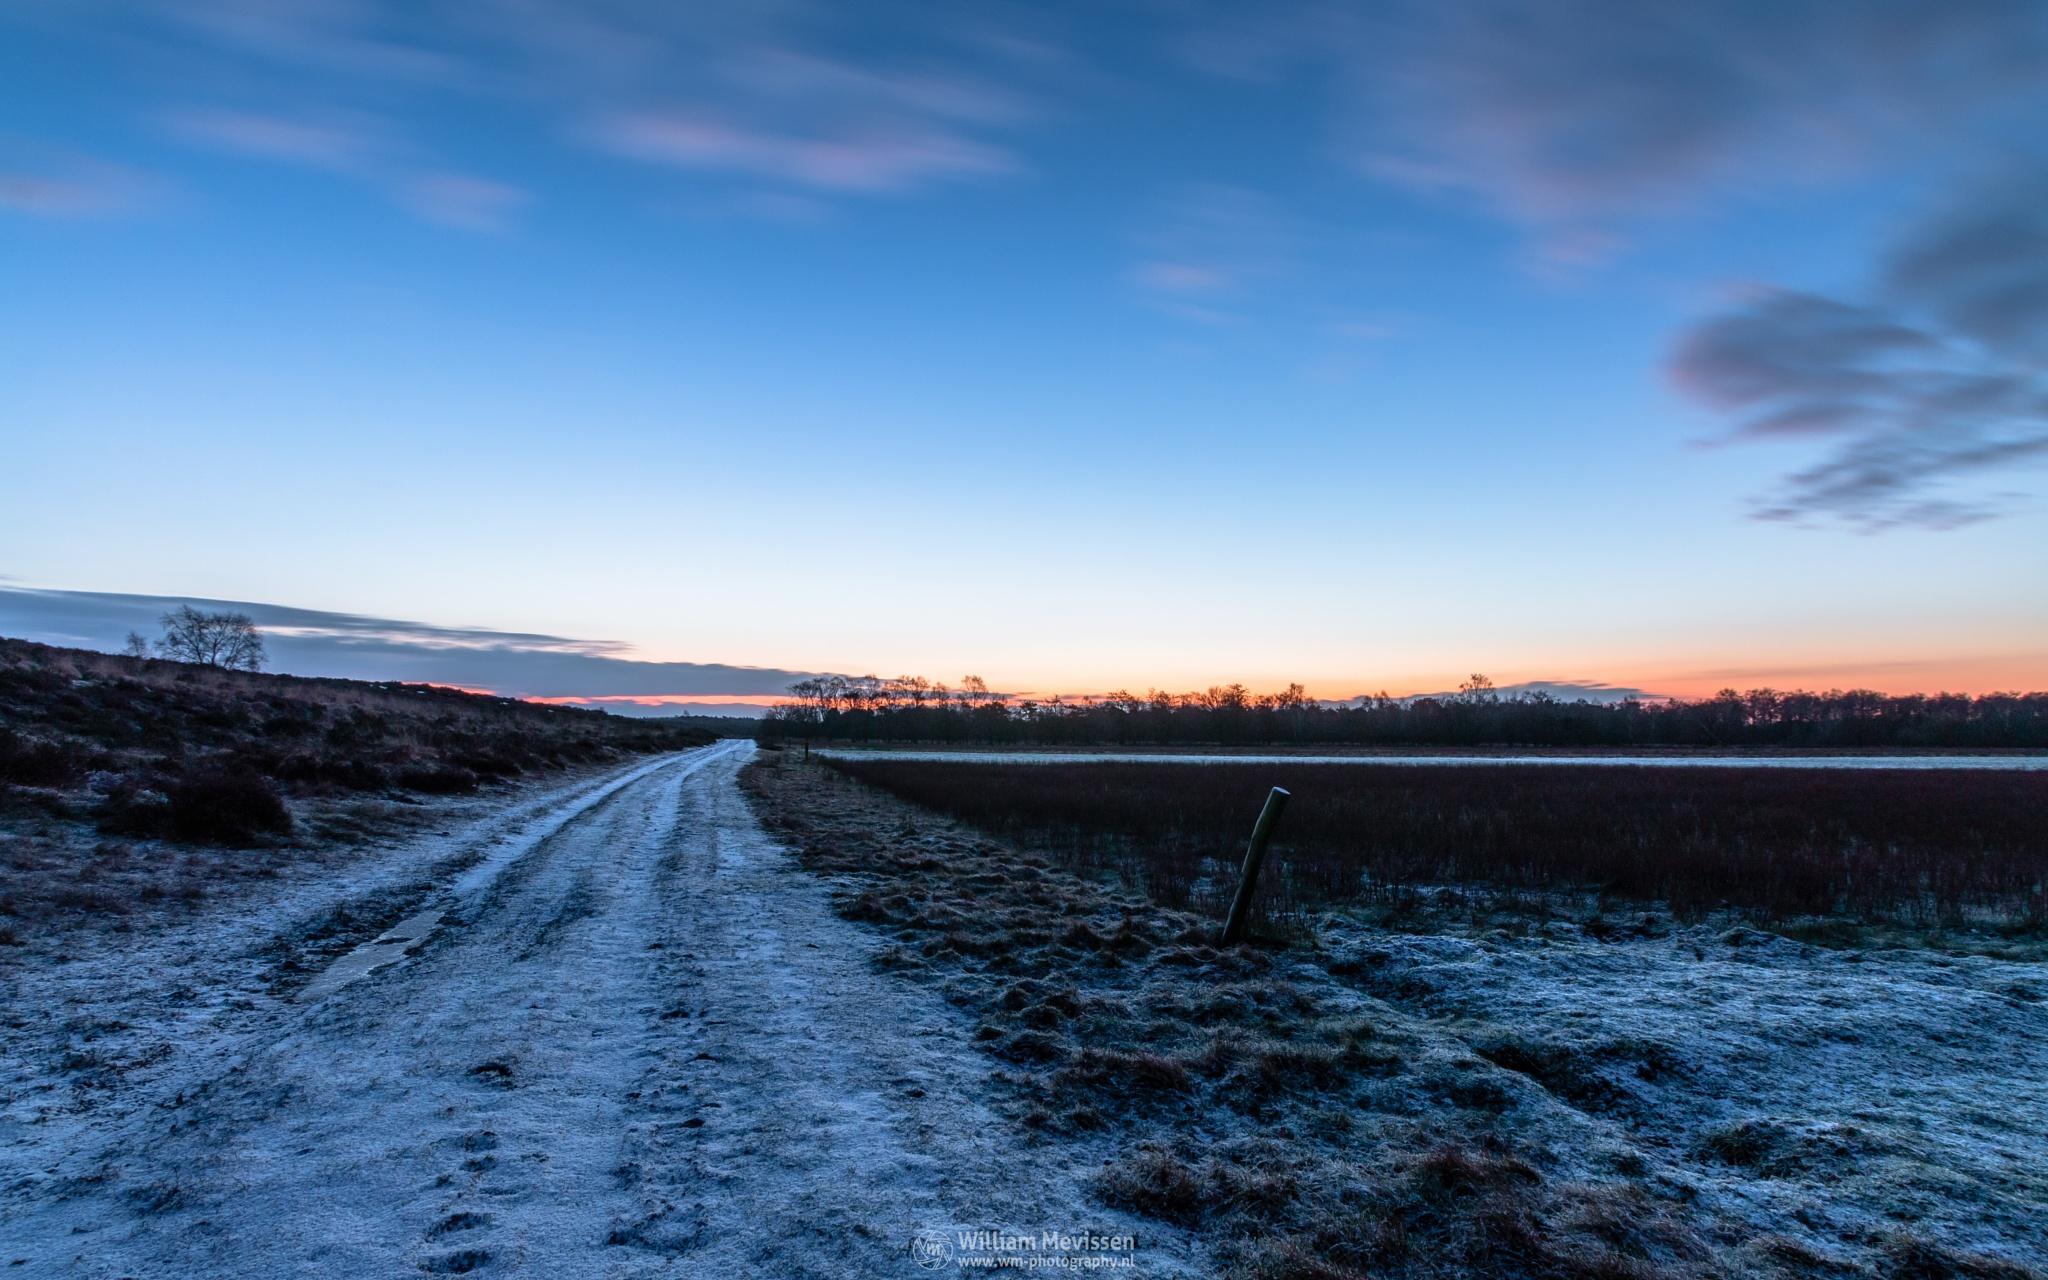 Photo in Landscape #bergerheide #forest #woods #heathland #maasduinen #limburg #noord-limburg #nieuw-bergen #bergen #national park #nature #sand #dunes #sanddunes #tree #trees #sky #clouds #twilight #snow #winter #le #long exposure #dirt road #road